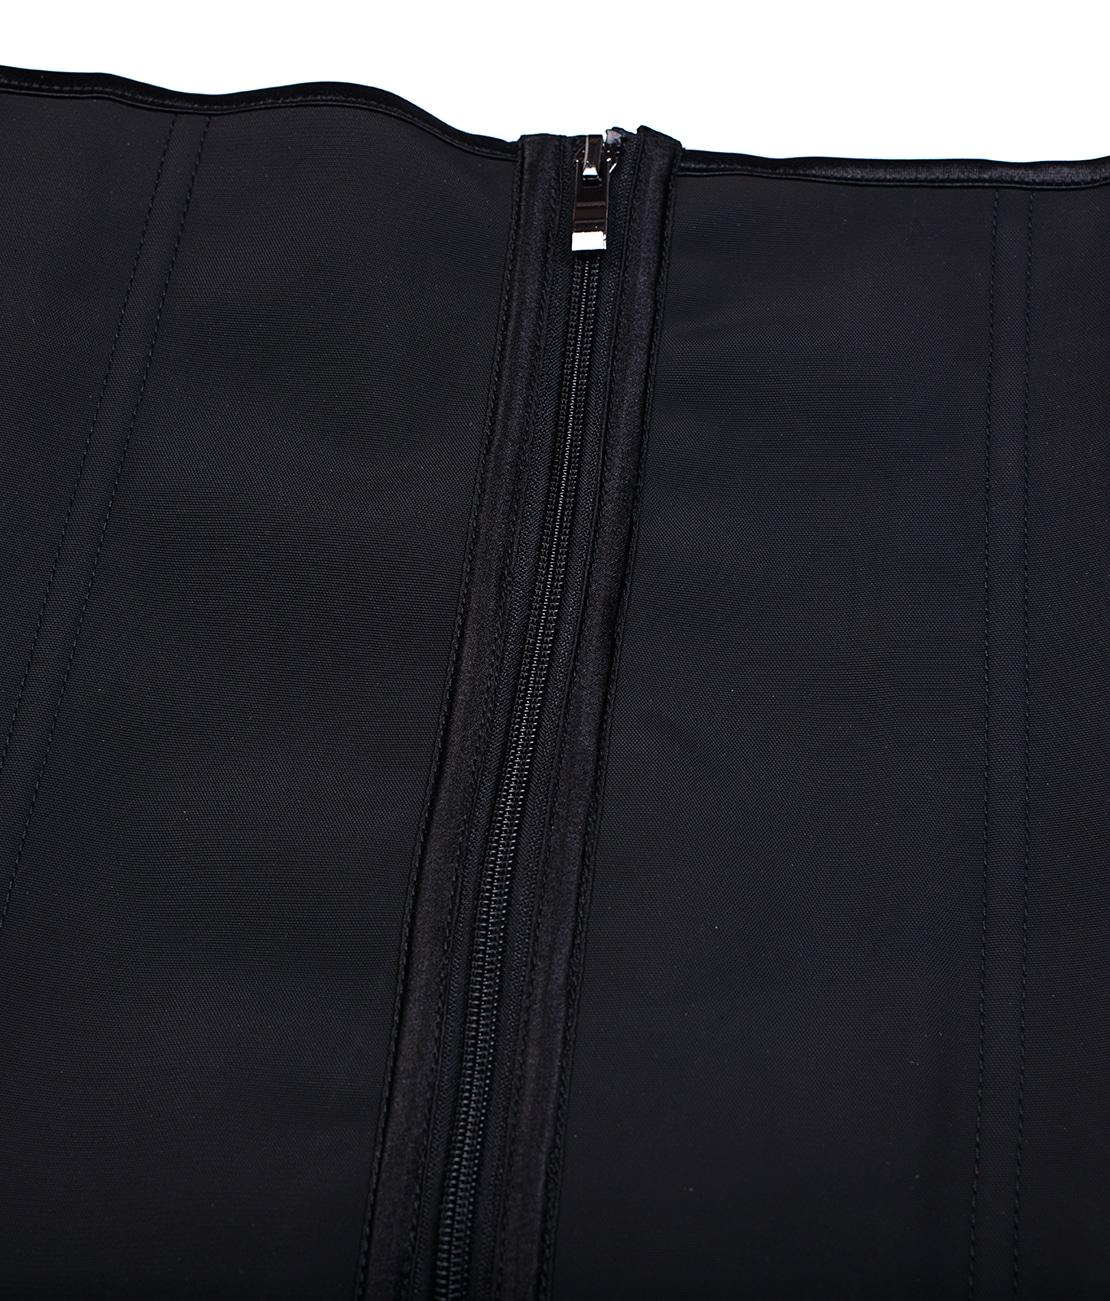 Gaine Minceur Packshot Detail 2